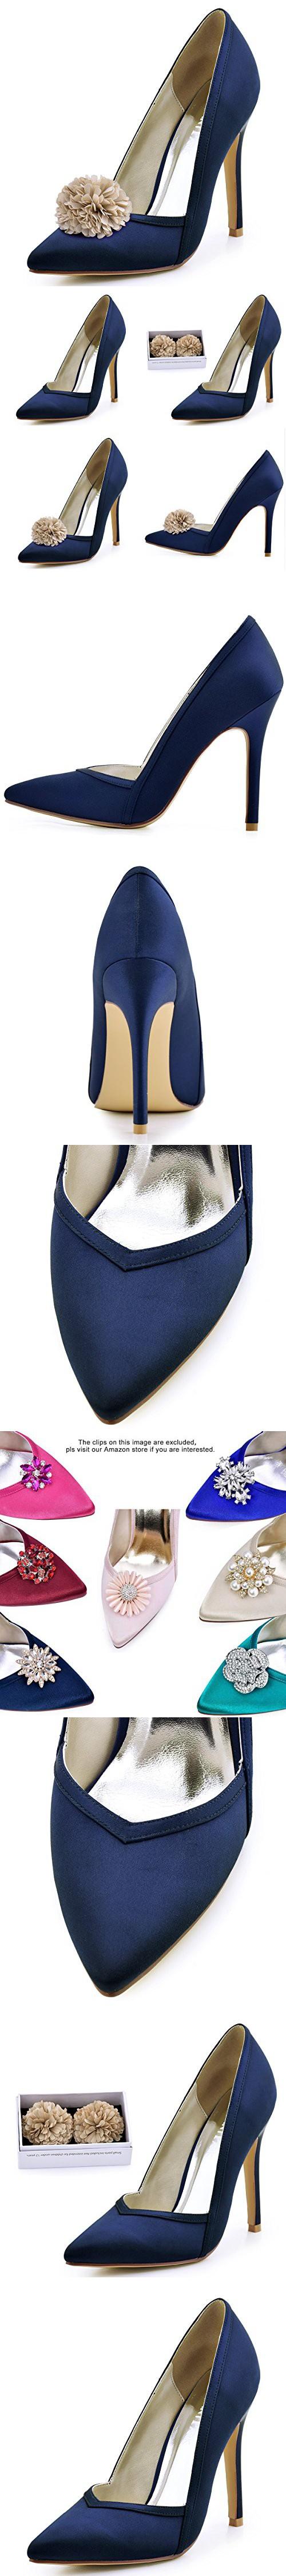 Elegantpark hc womenus pointed toe high heel v cut slip on satin